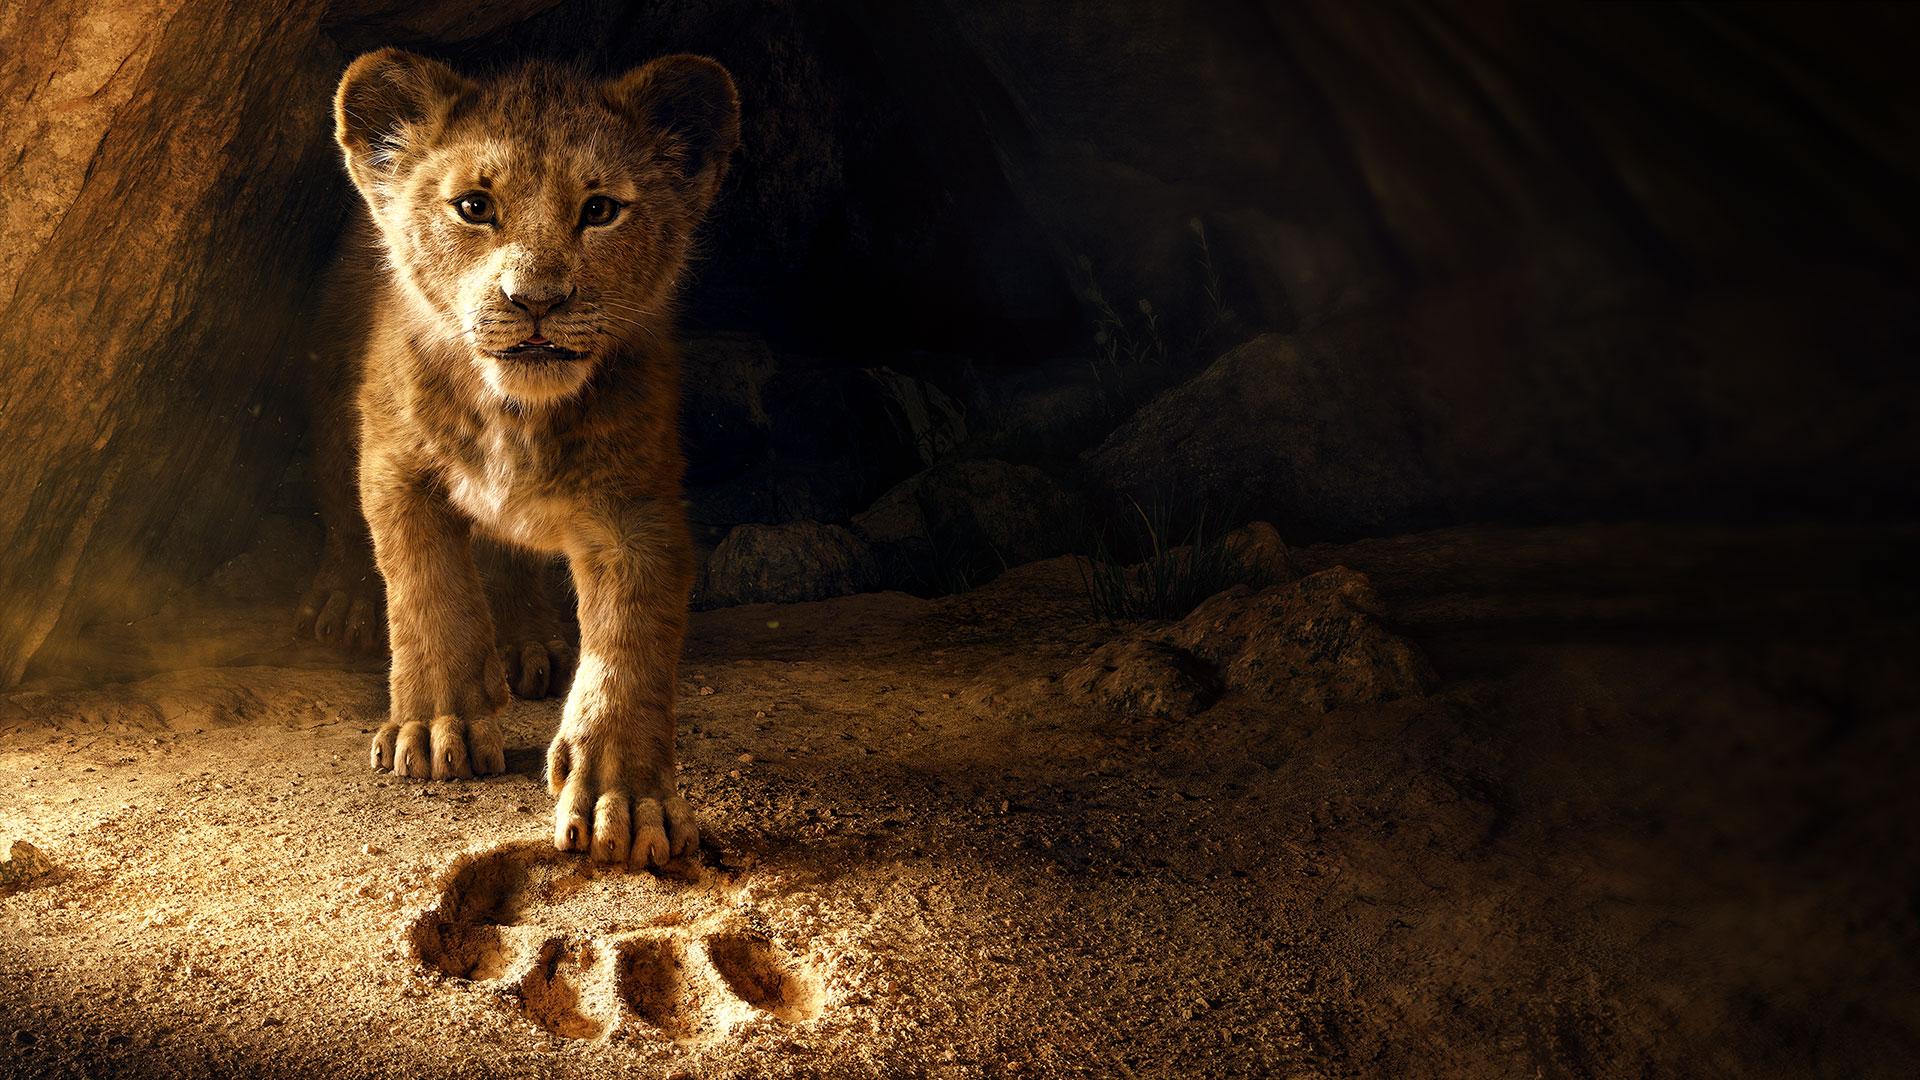 Buy The Lion King 2019 Bonus   Microsoft Store 1920x1080